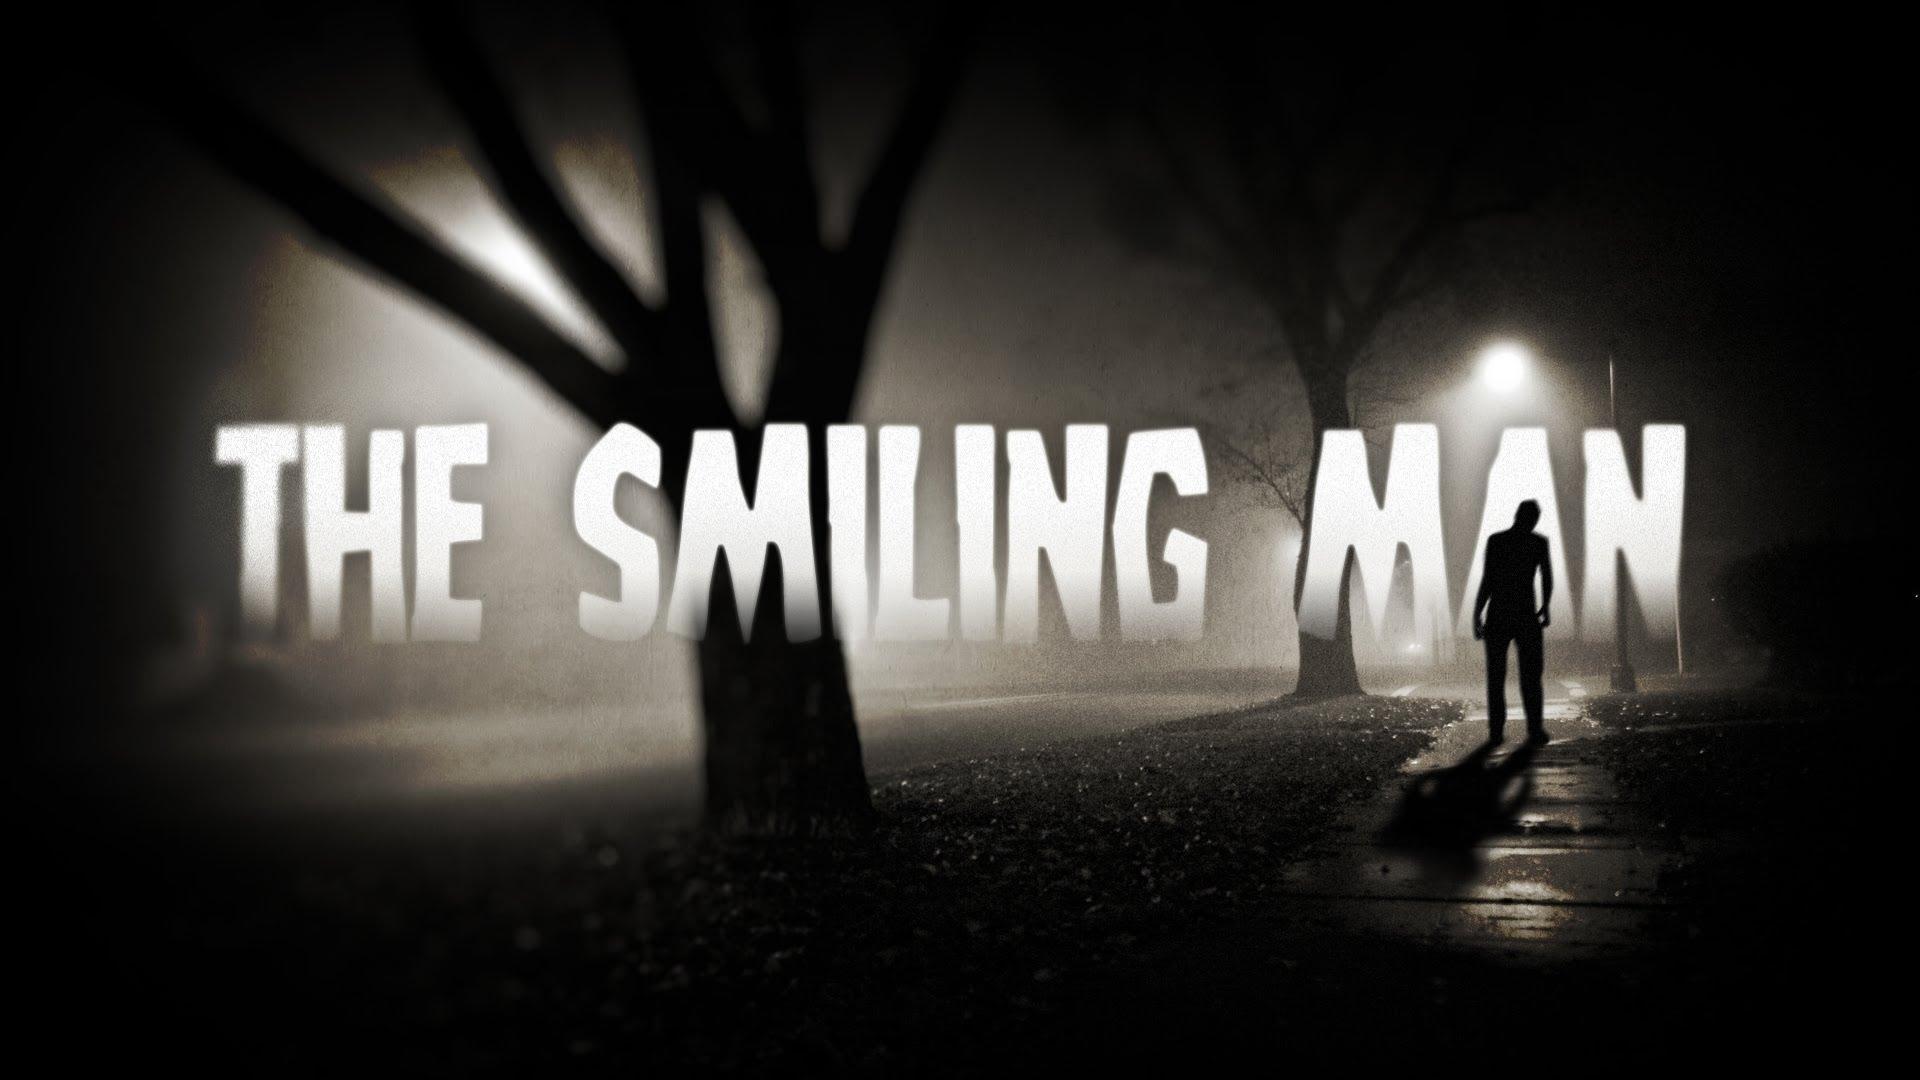 The Smiling Man - A mosolygó férfi 1. kép